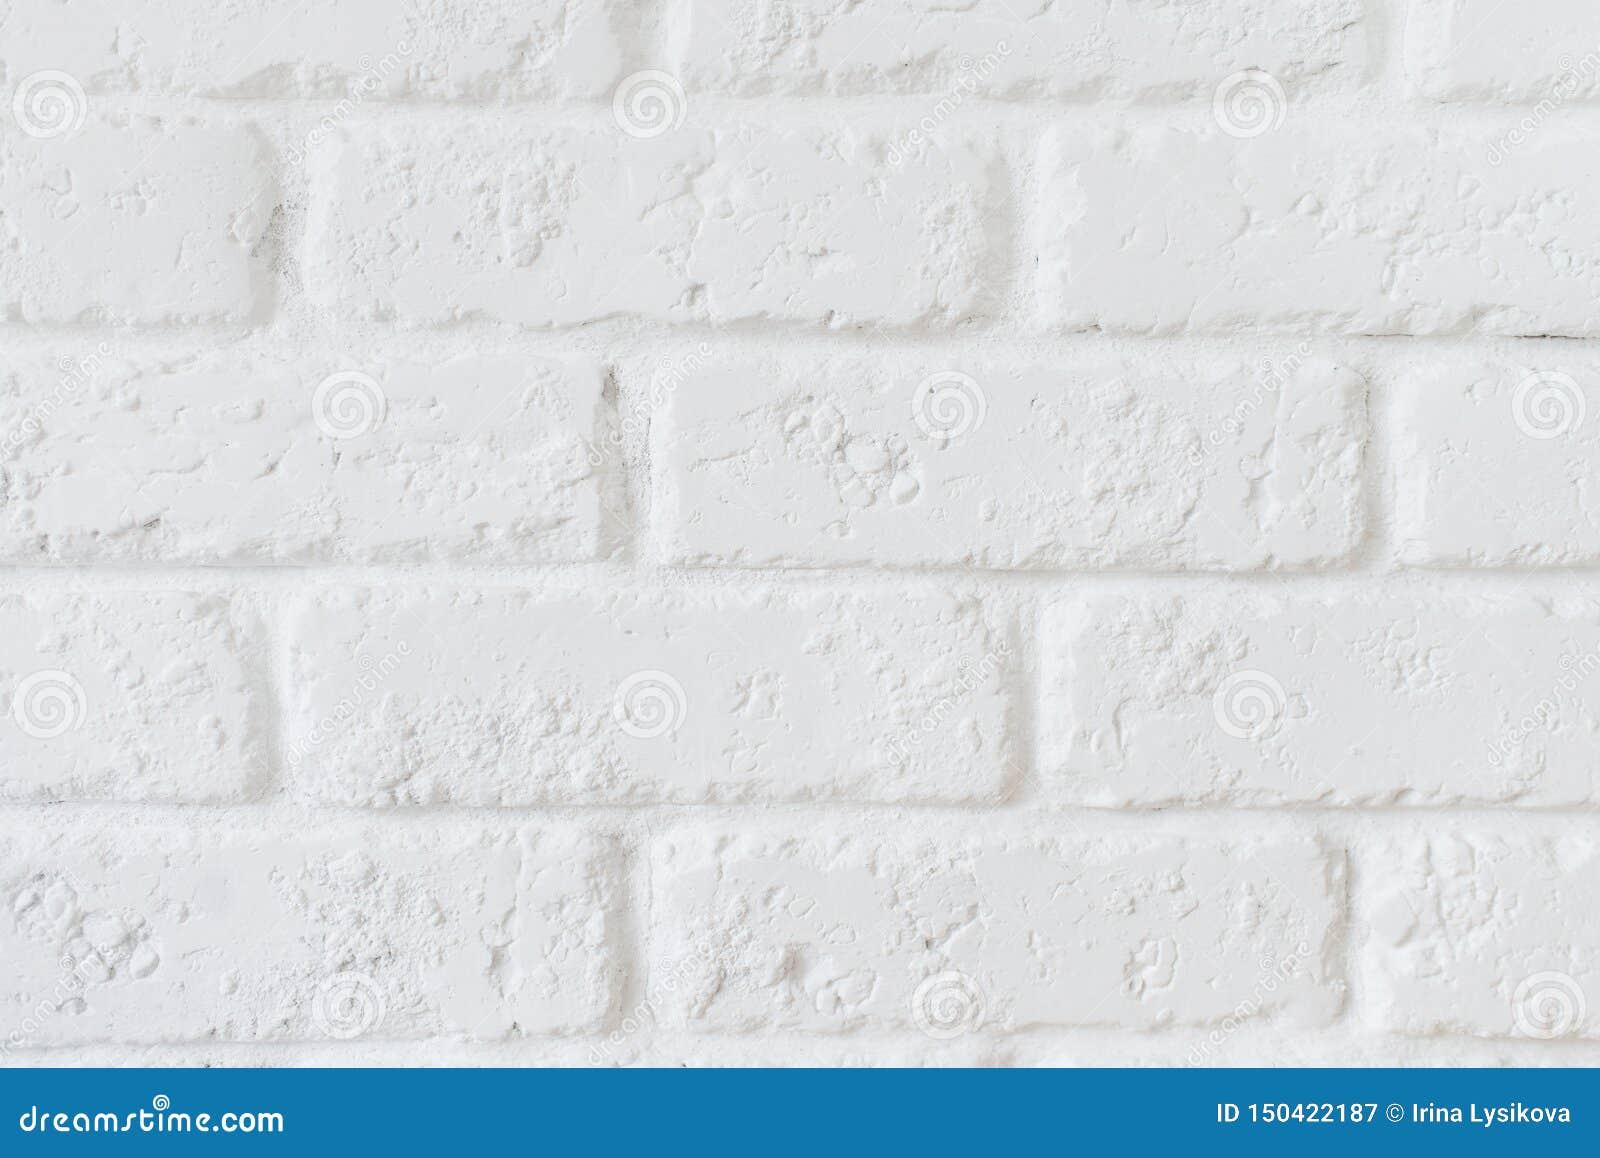 Kitchen Wallpaper Concept Close Up Modern White Brick Tiles